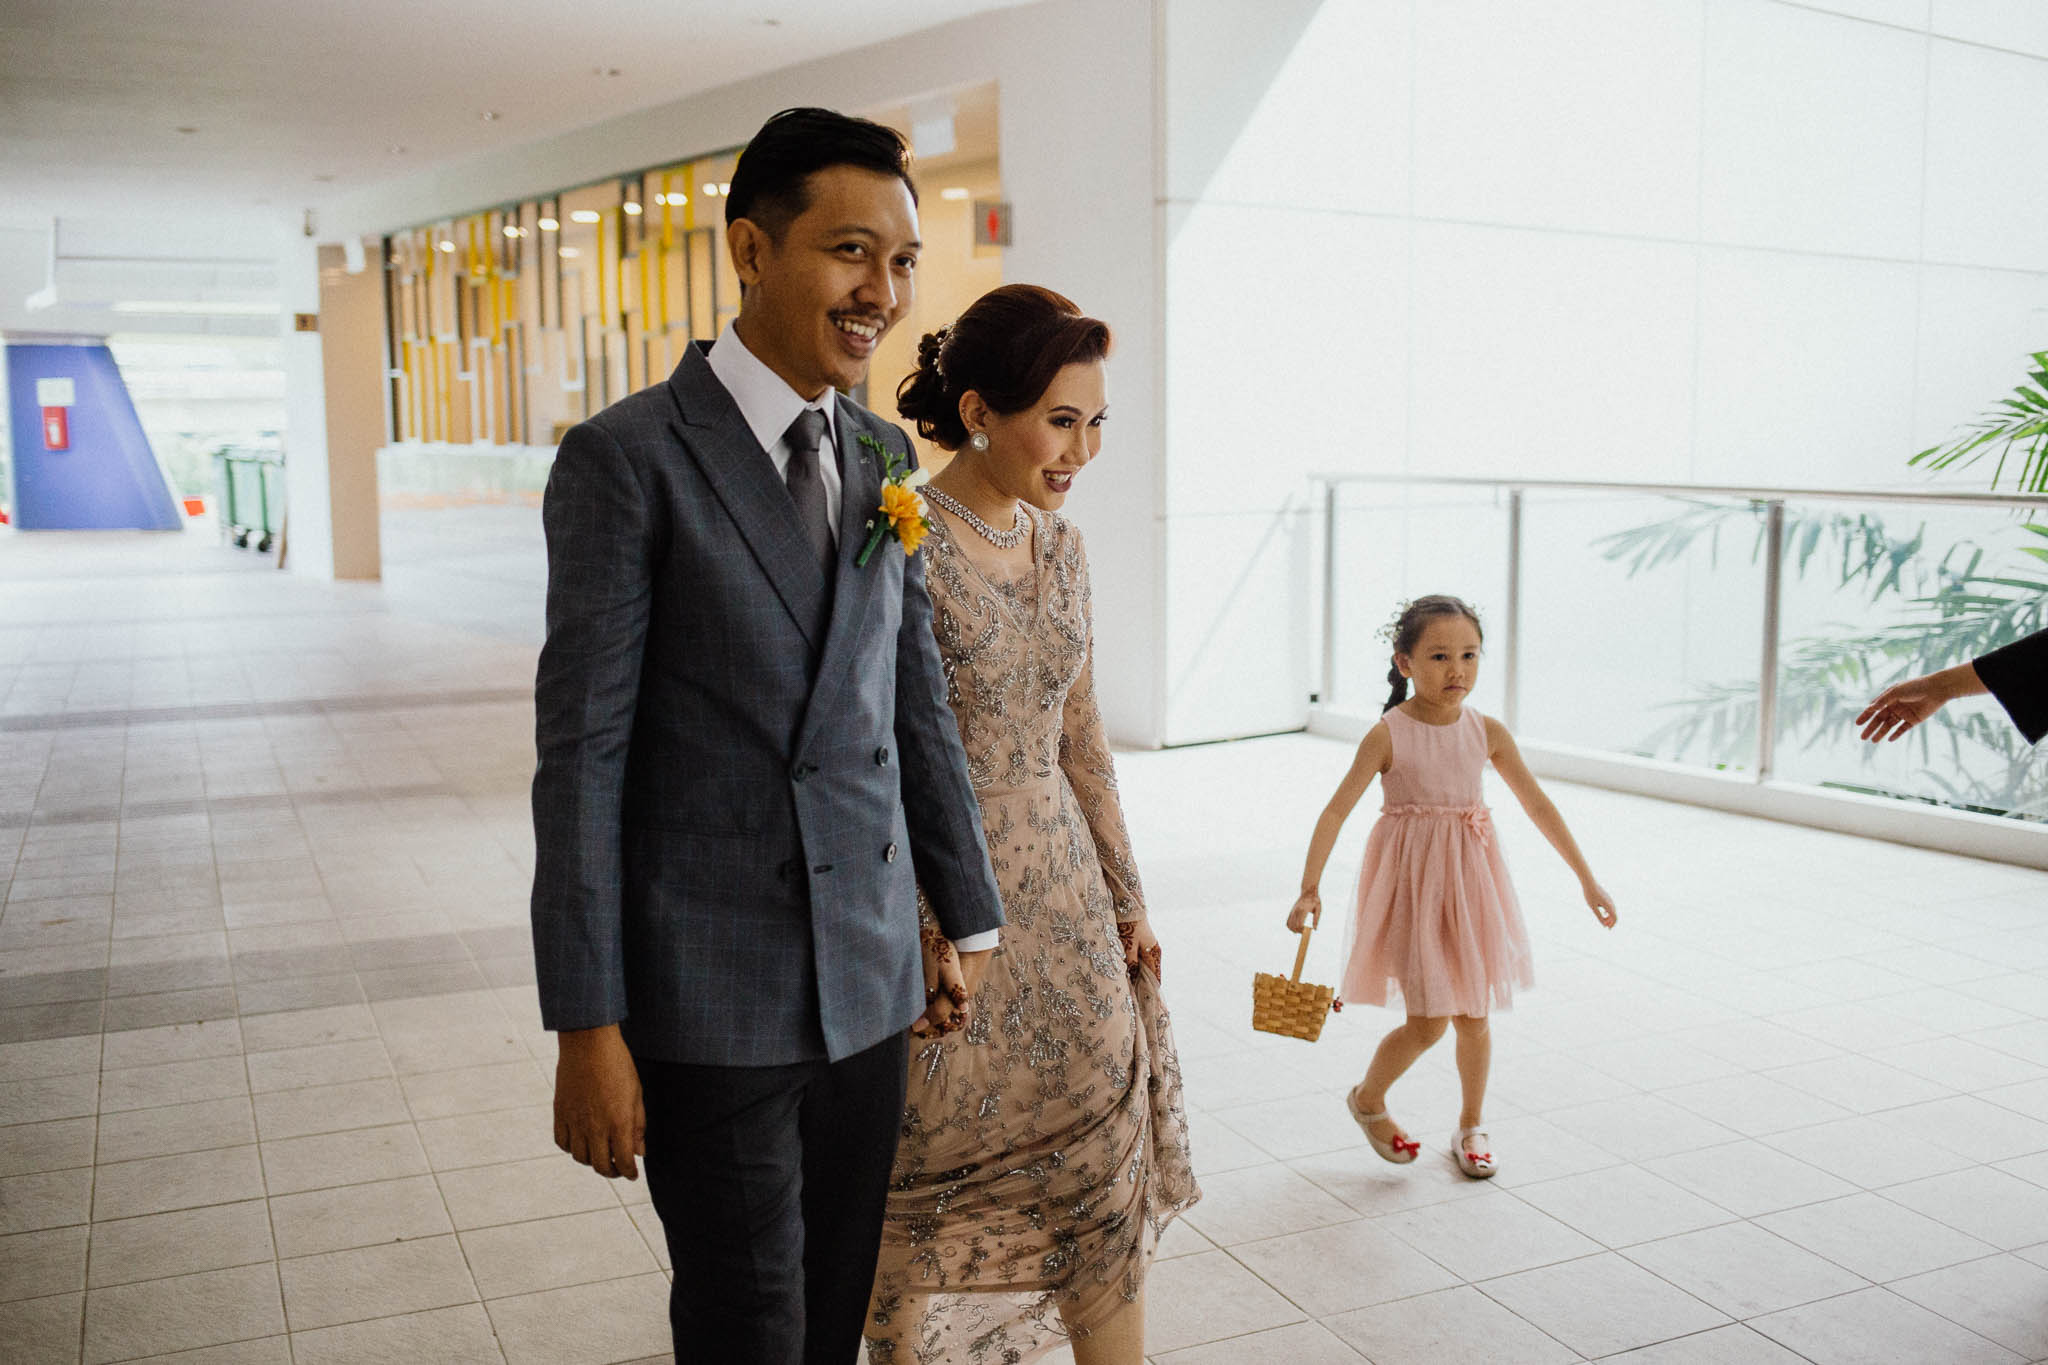 singapore-wedding-photographer-addafiq-nufail-042.jpg